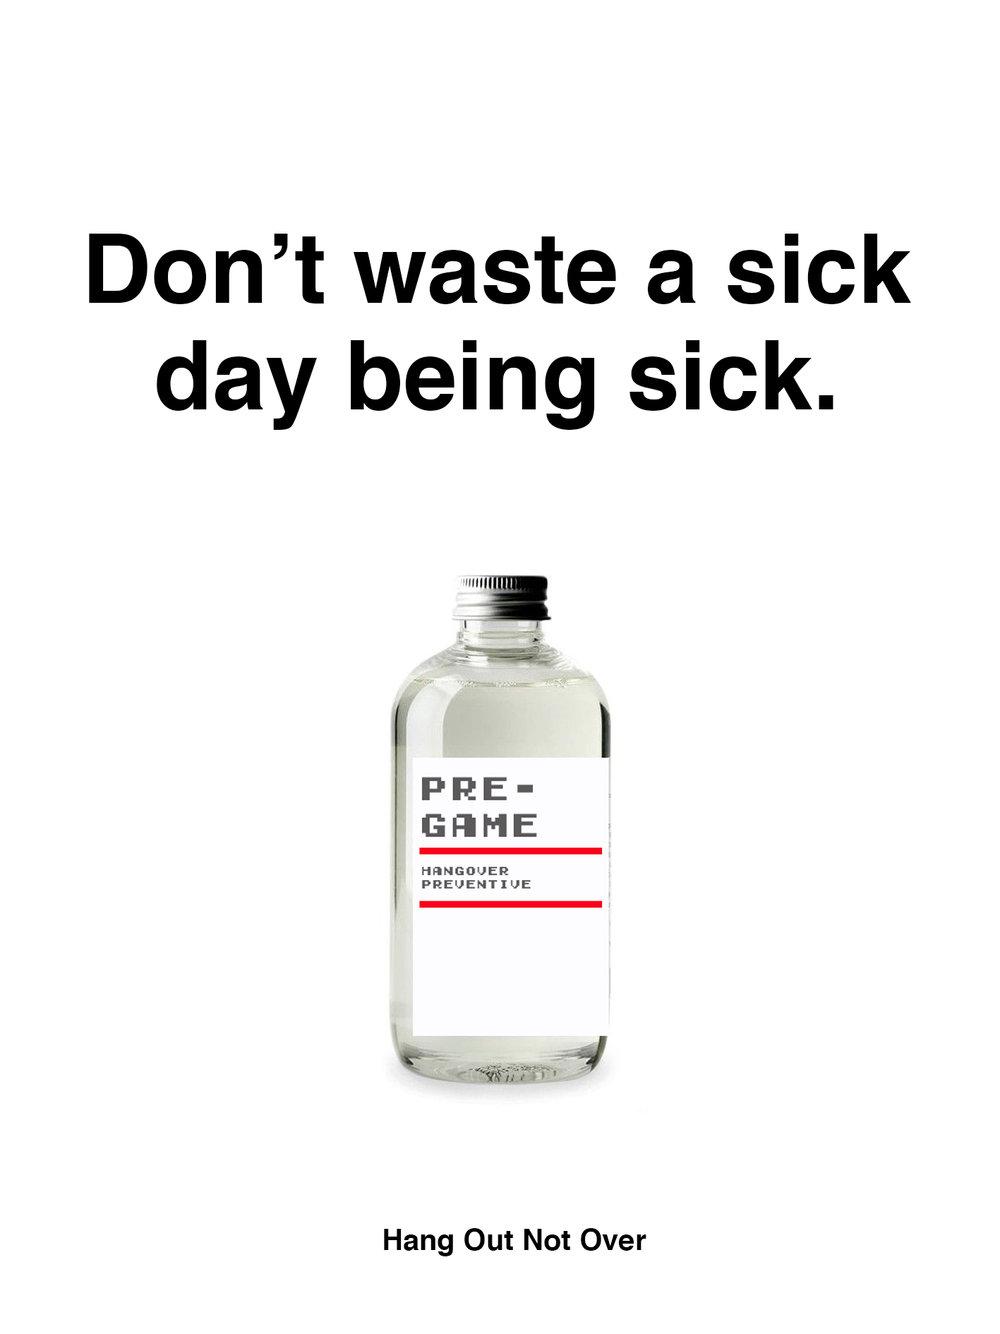 sick day copy.jpg